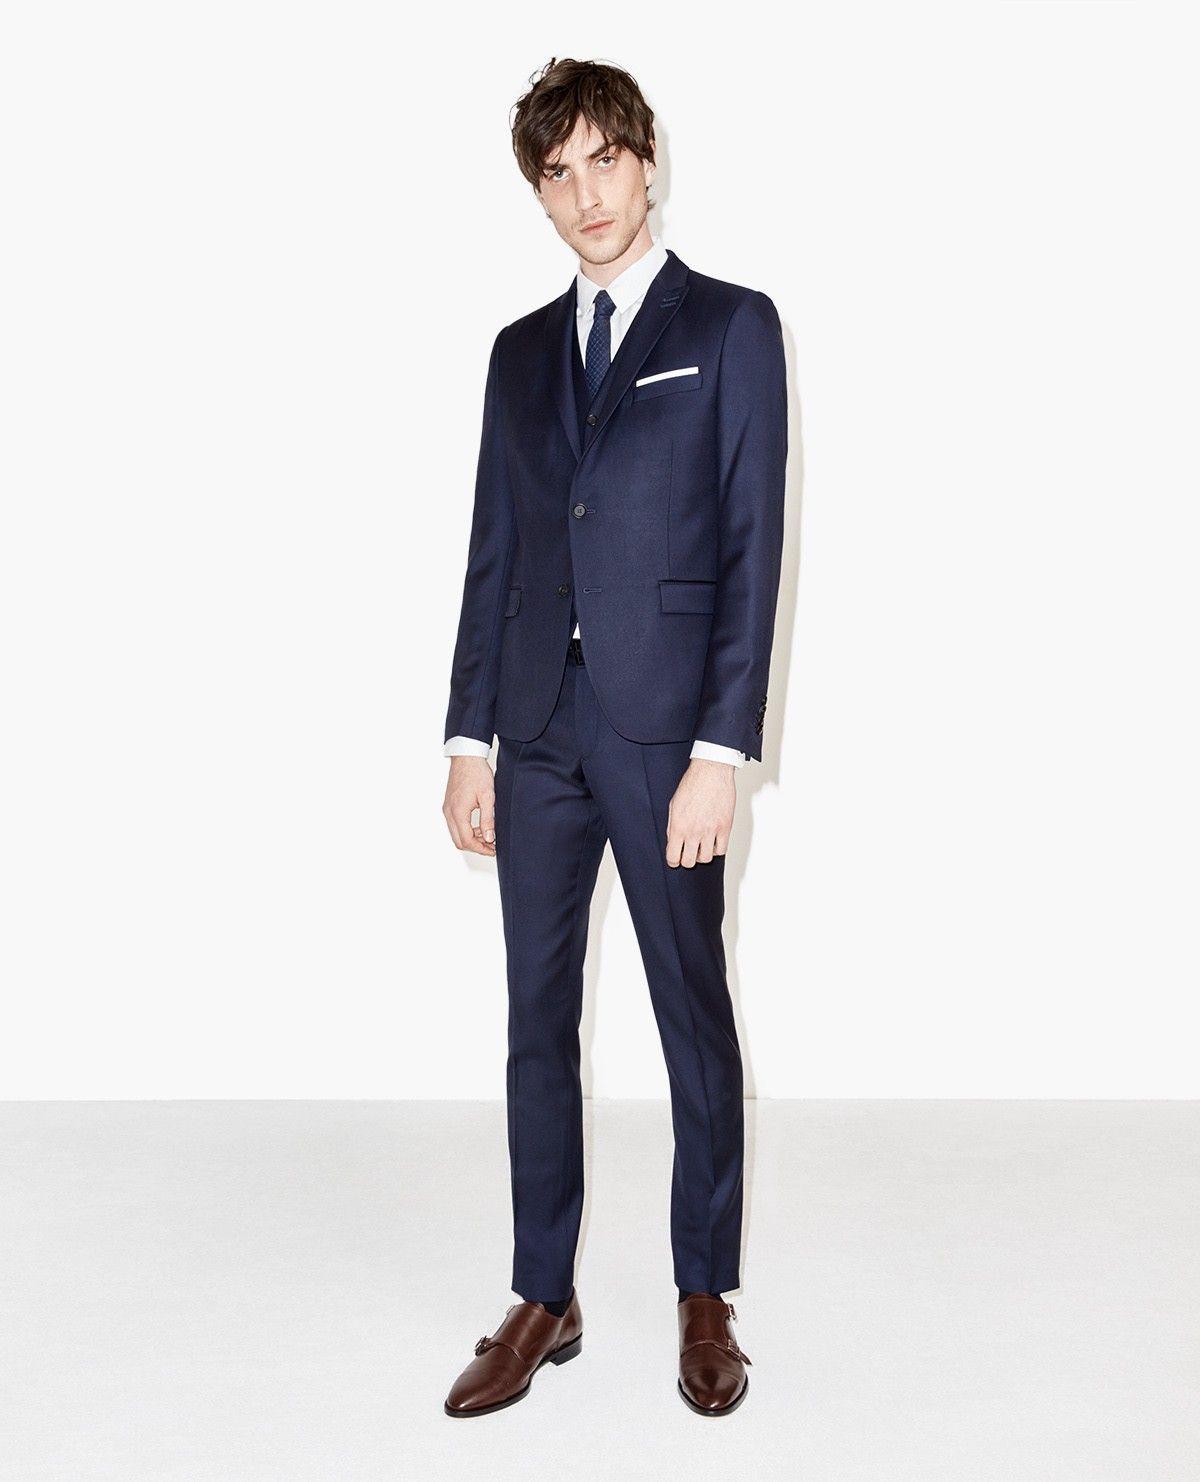 a723ca71d0 Super 100's suit - COSTUME MAN | Matthan's Clothes | The kooples ...